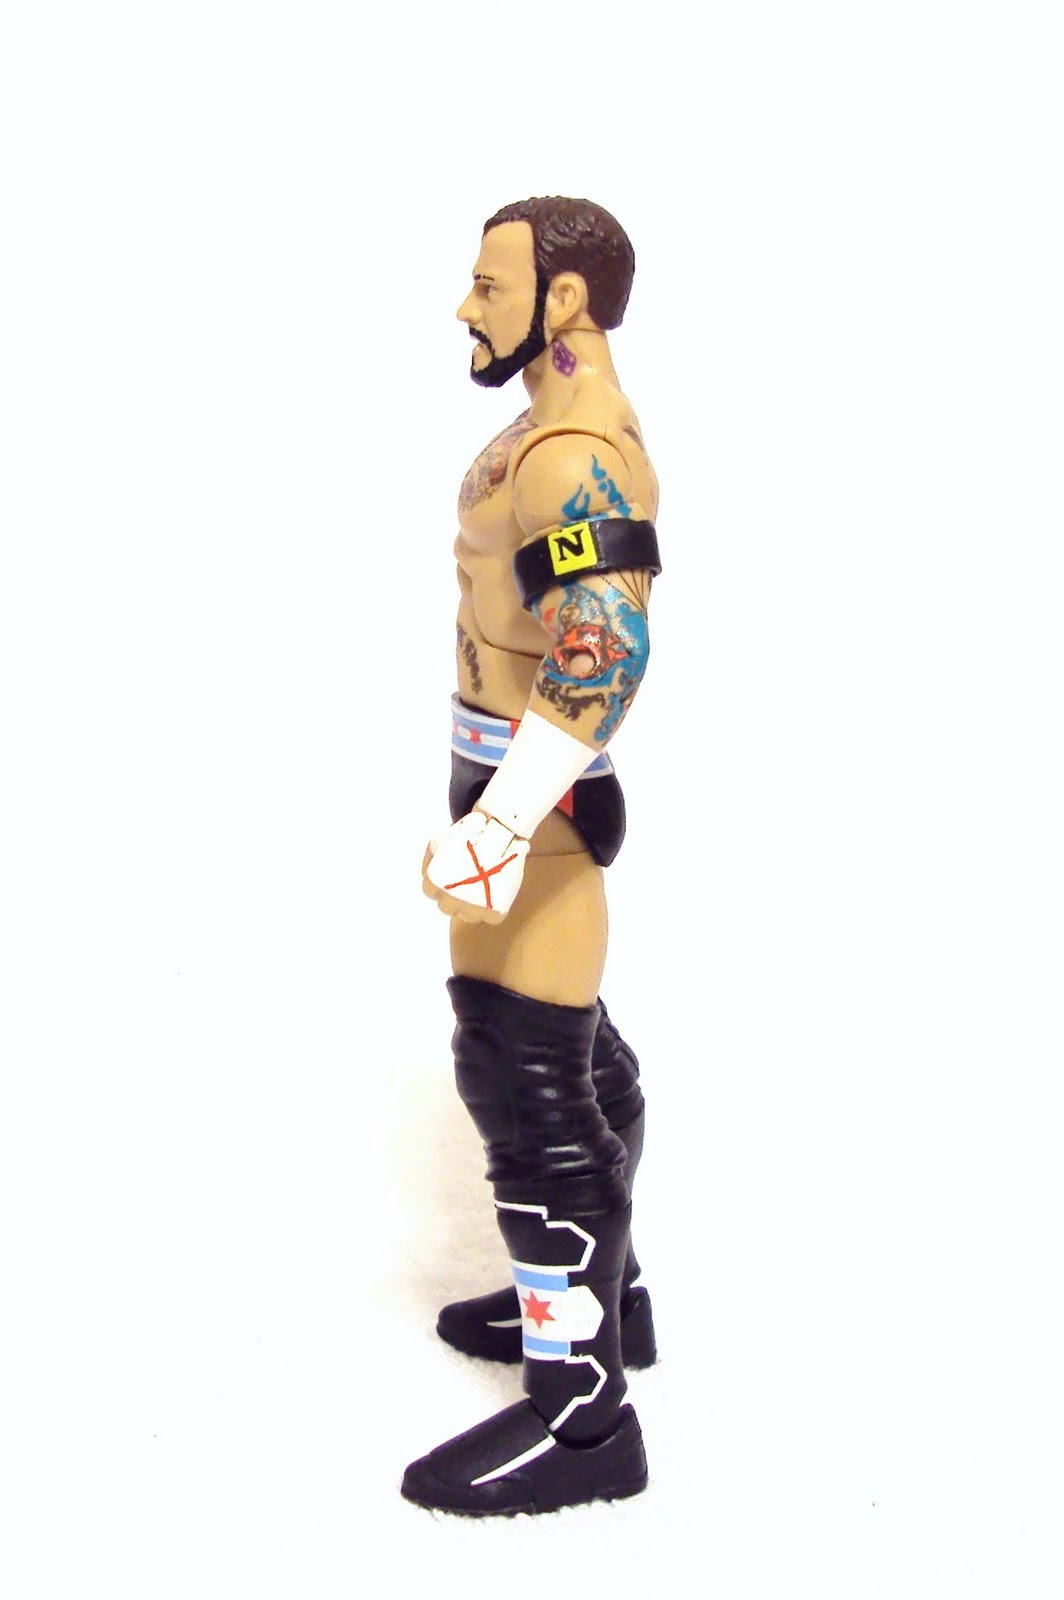 Punk Cm Wrestlemania 22